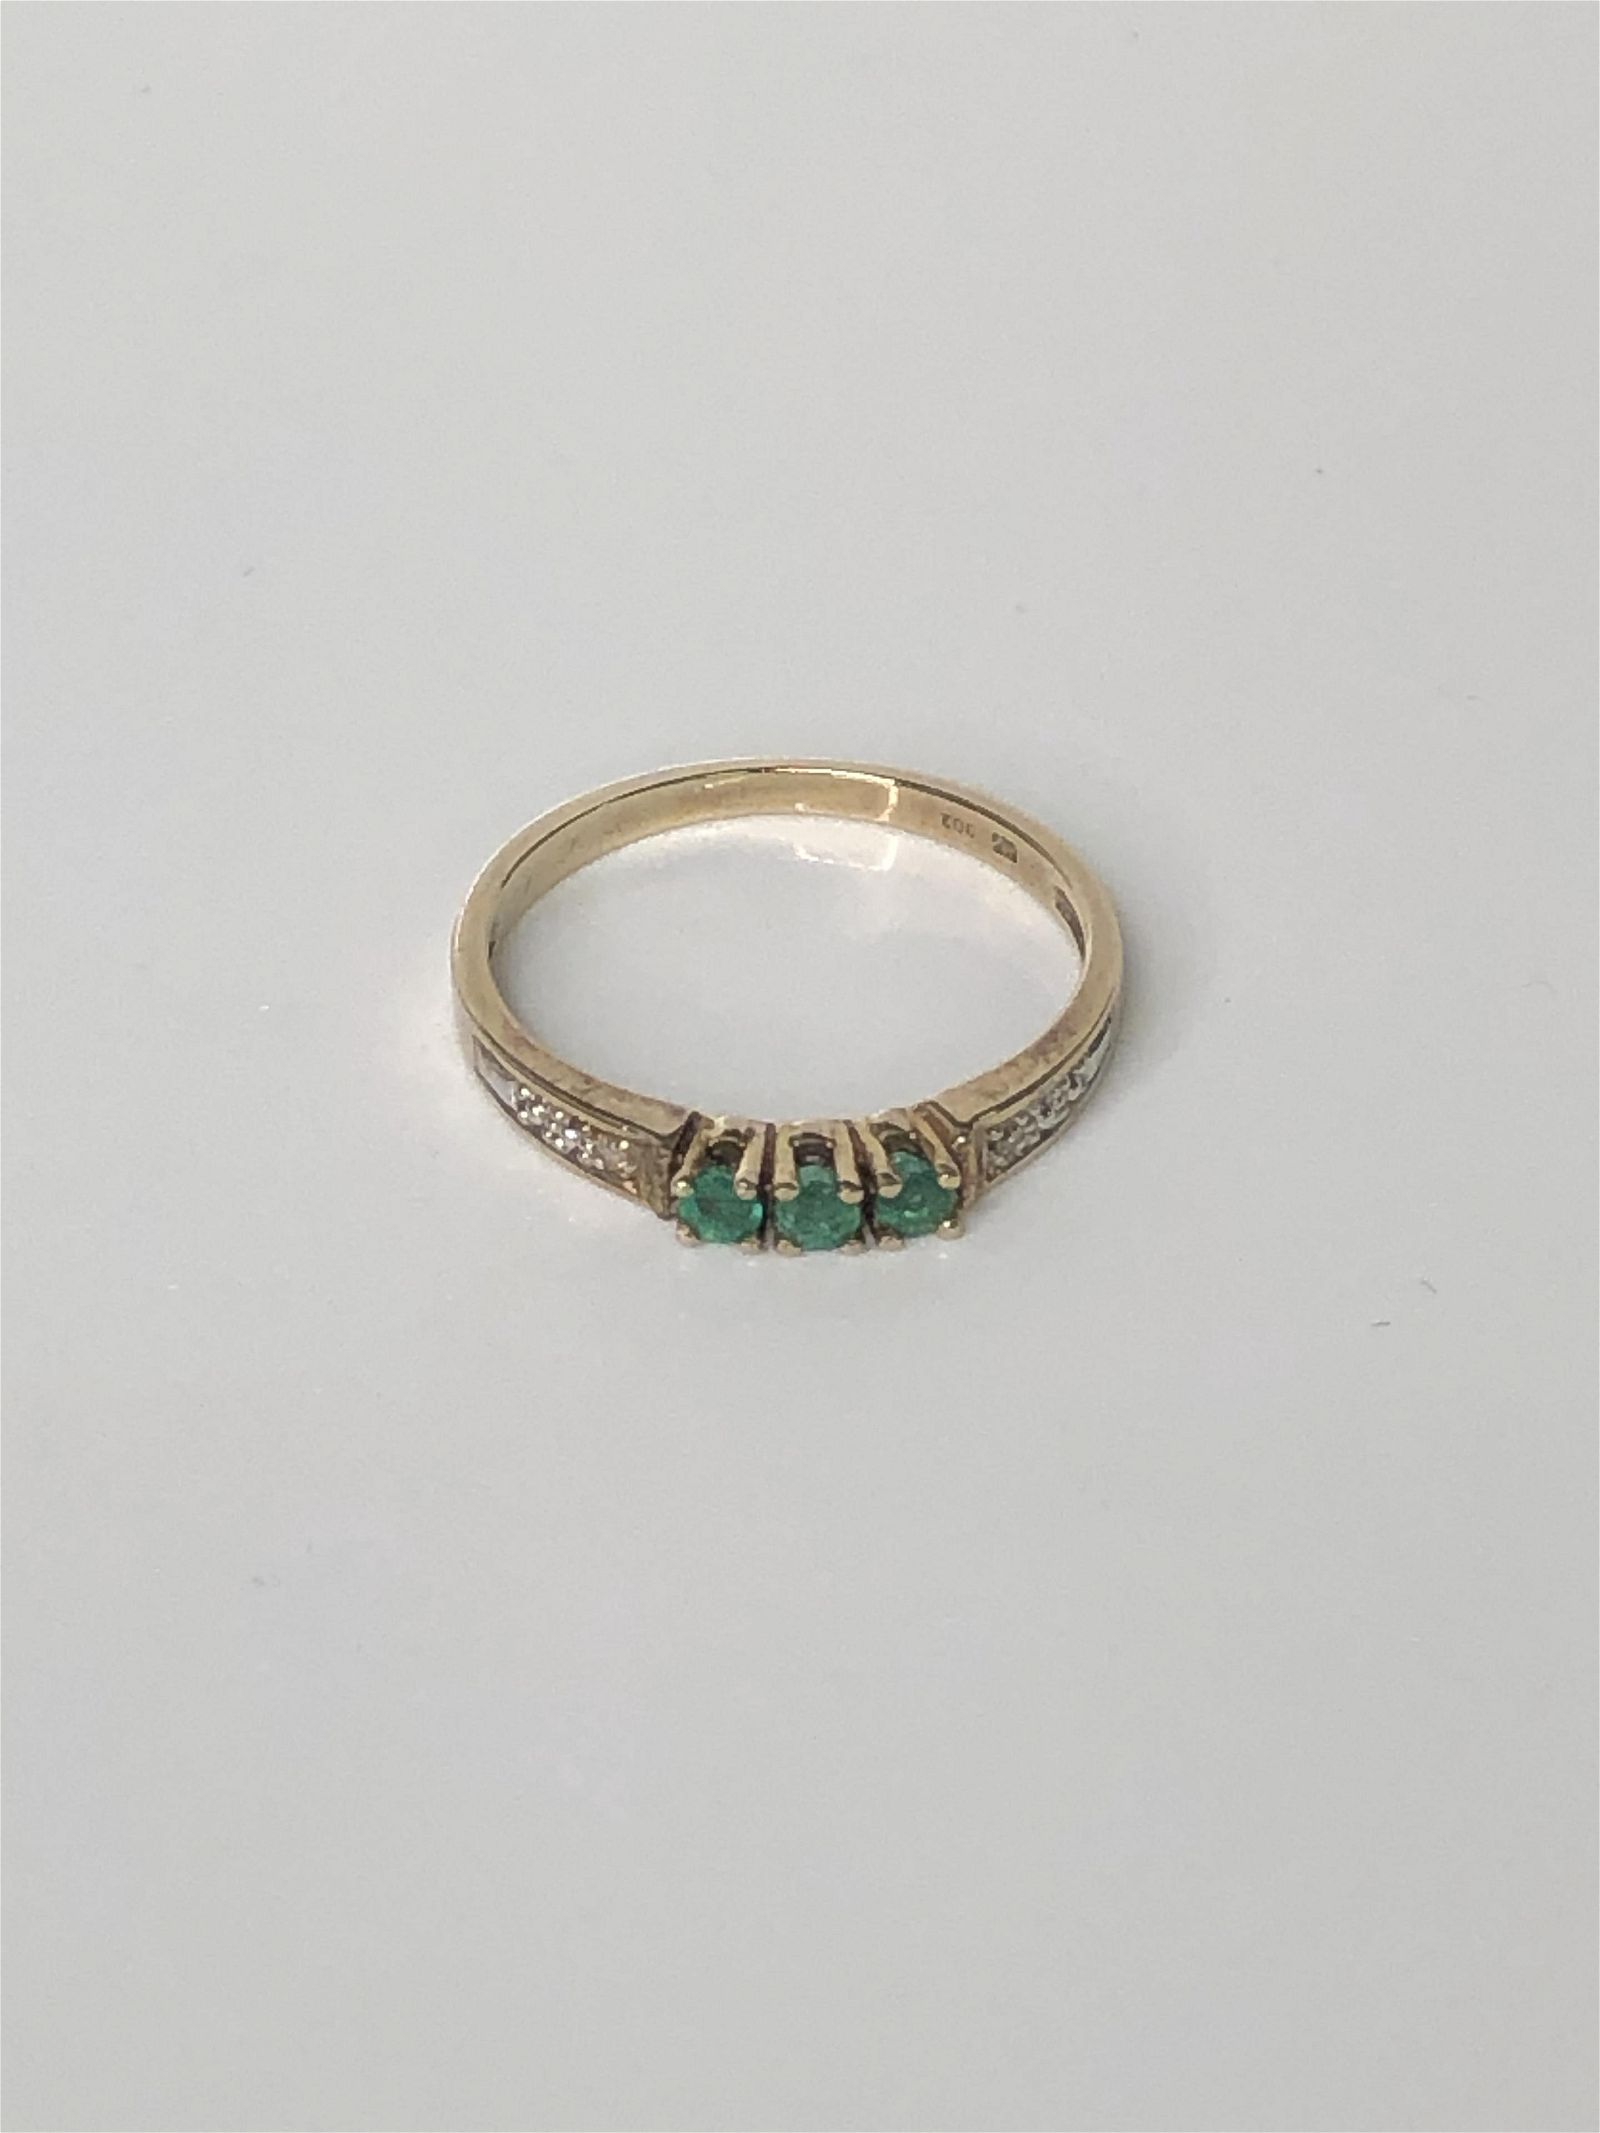 14 K Yellow Gold Emerald and Diamond Ring 1.76 grams,